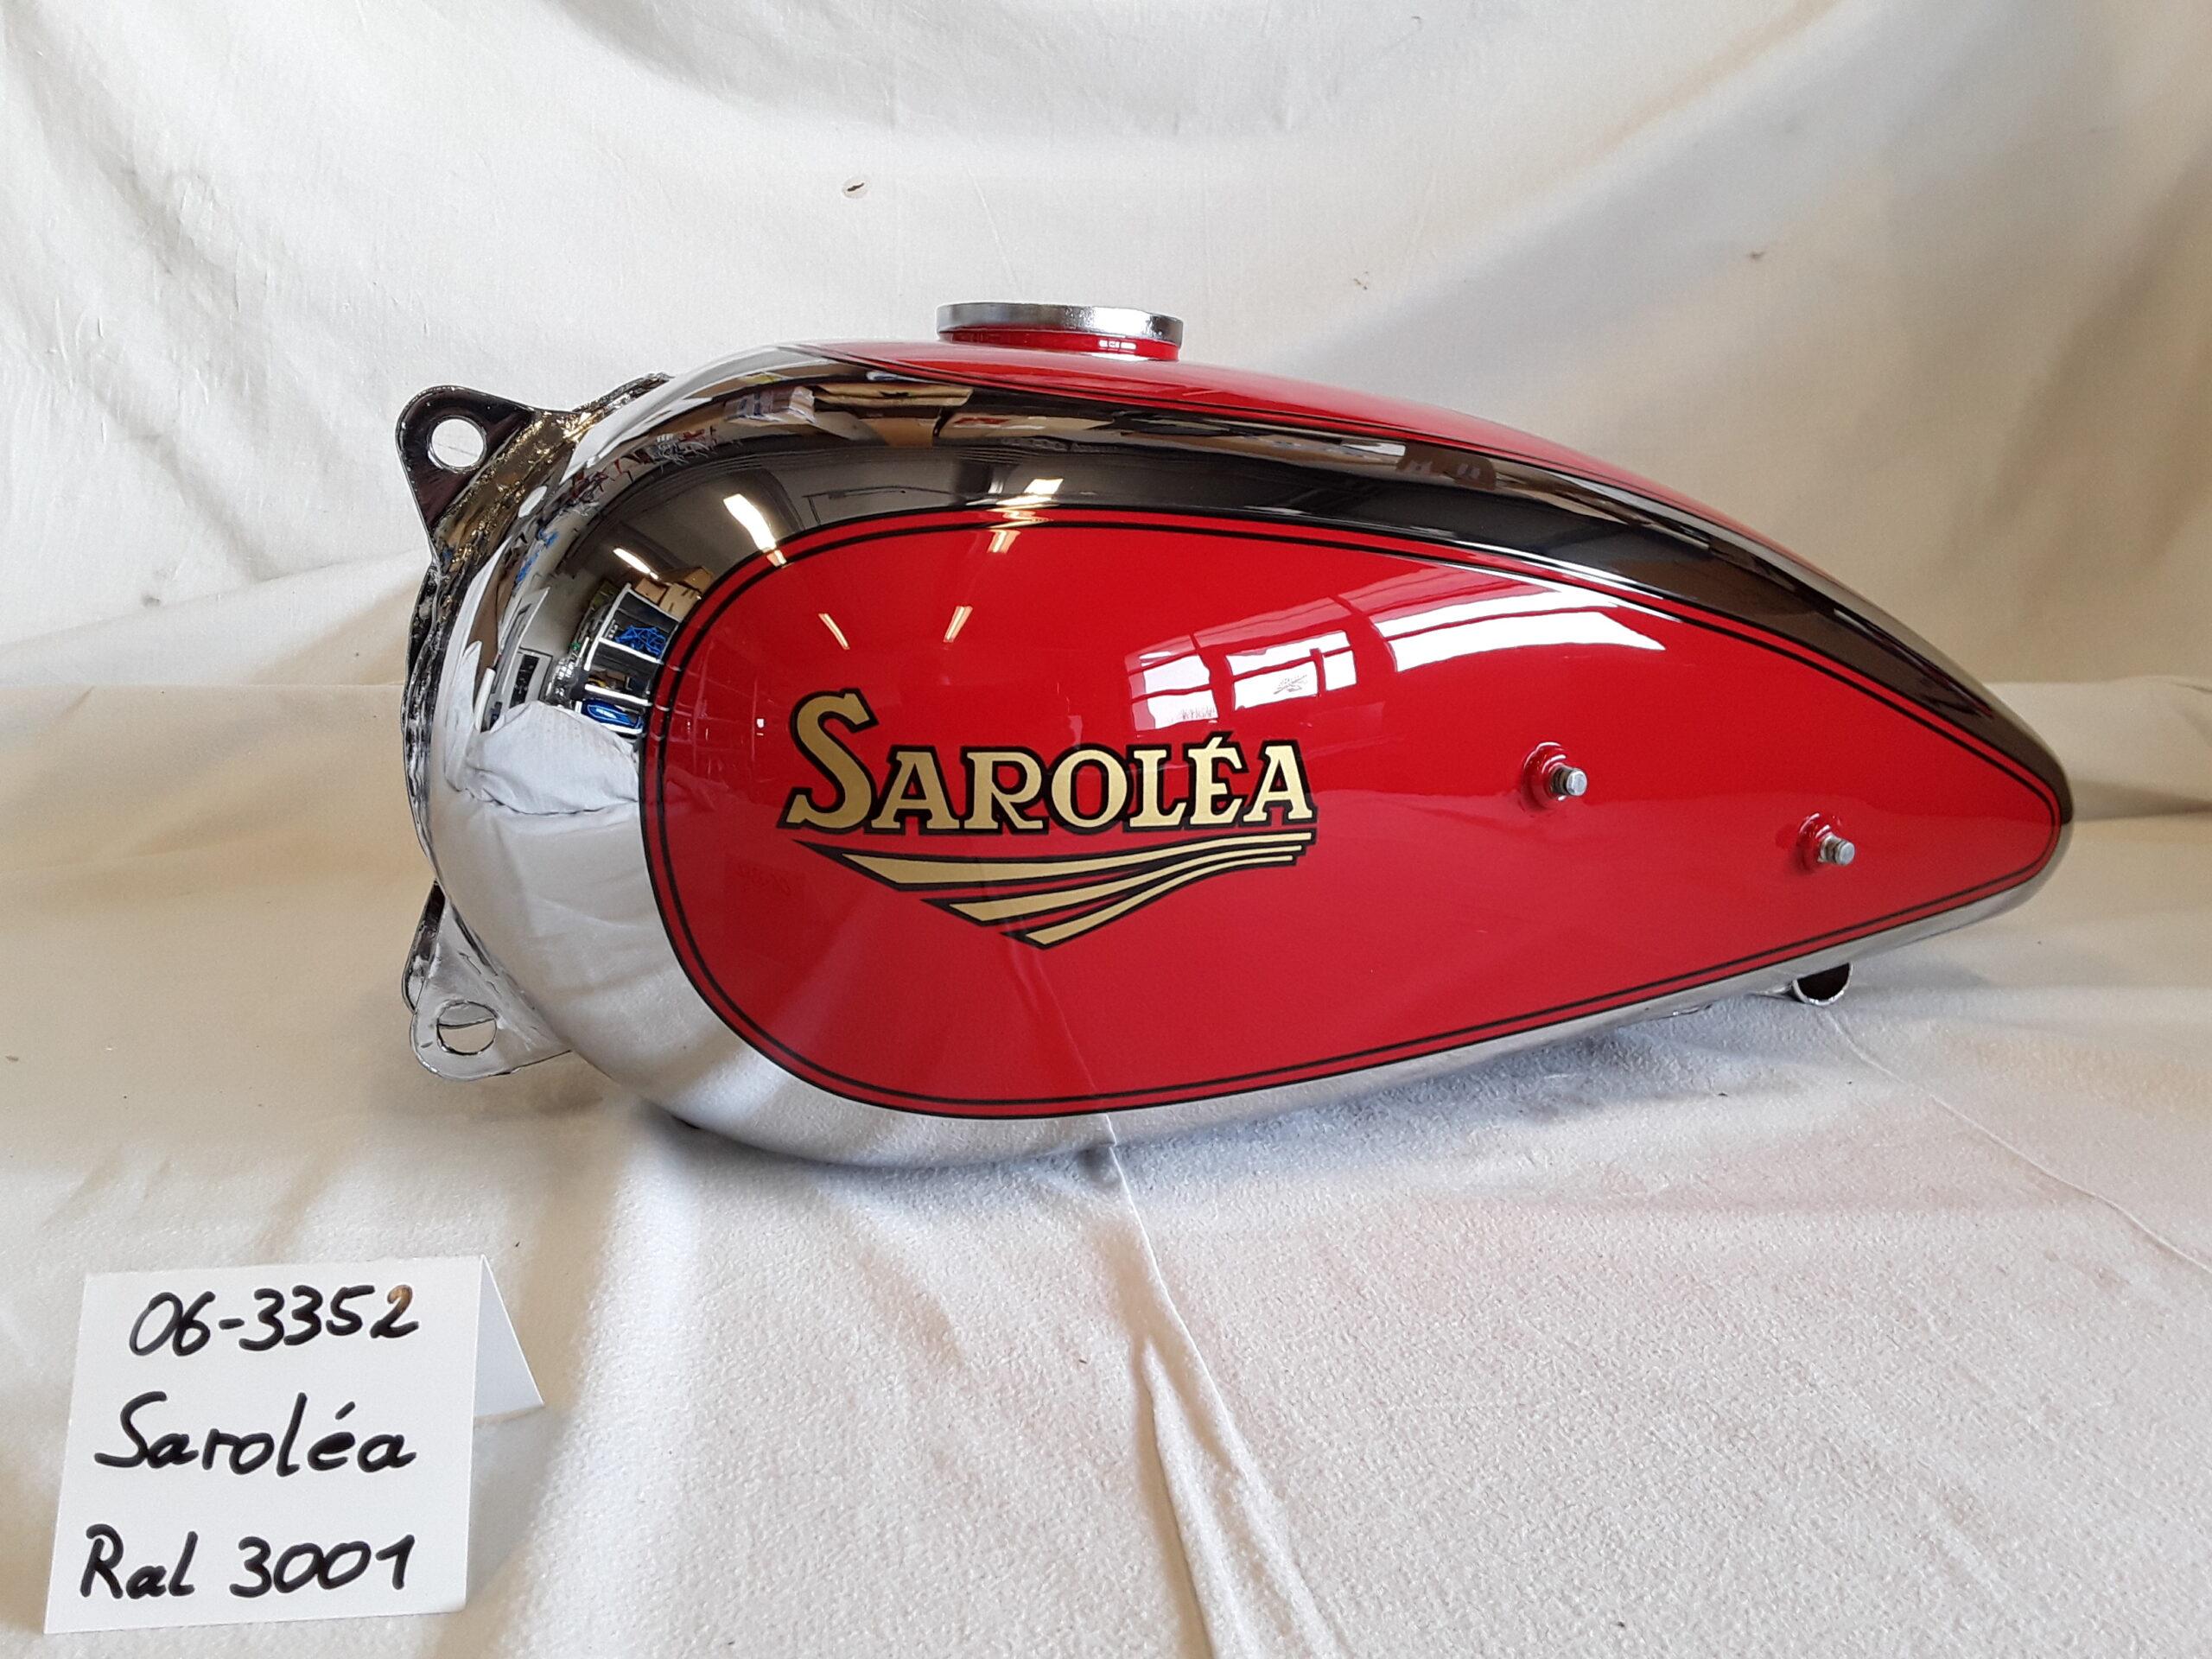 Saroléa in RAL 3001 RH-Lacke Lackiererei Motorradlackierung 06-3352